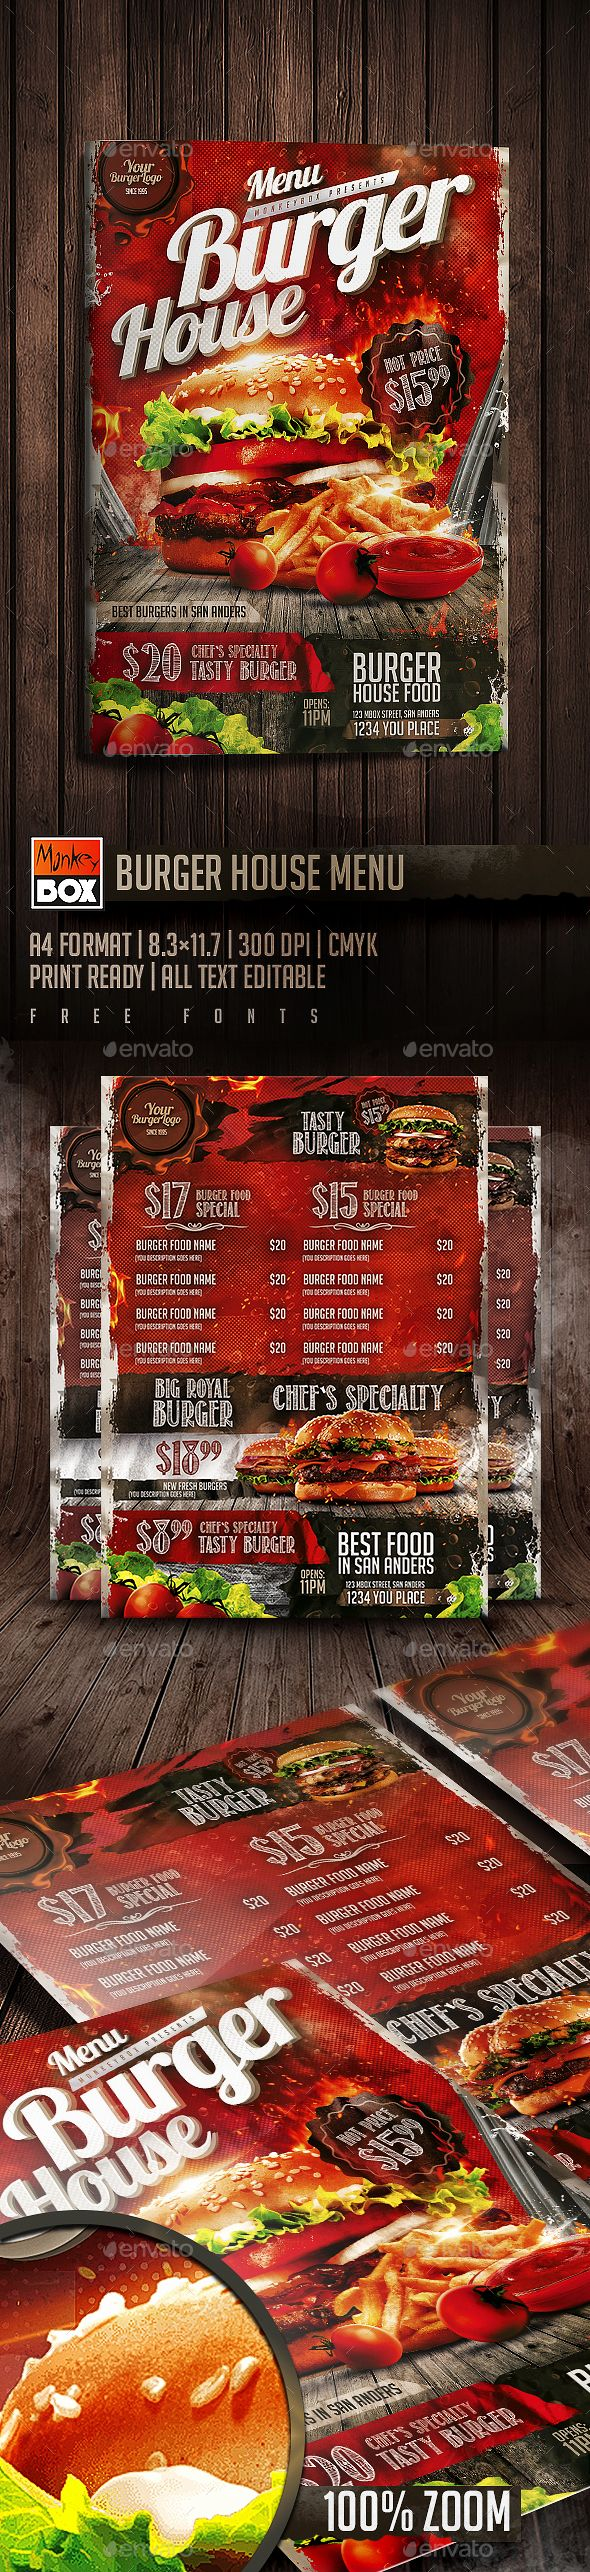 Burger House Menu Flyer Template PSD. Download here: http://graphicriver.net/item/burger-house-menu/15755637?ref=ksioks